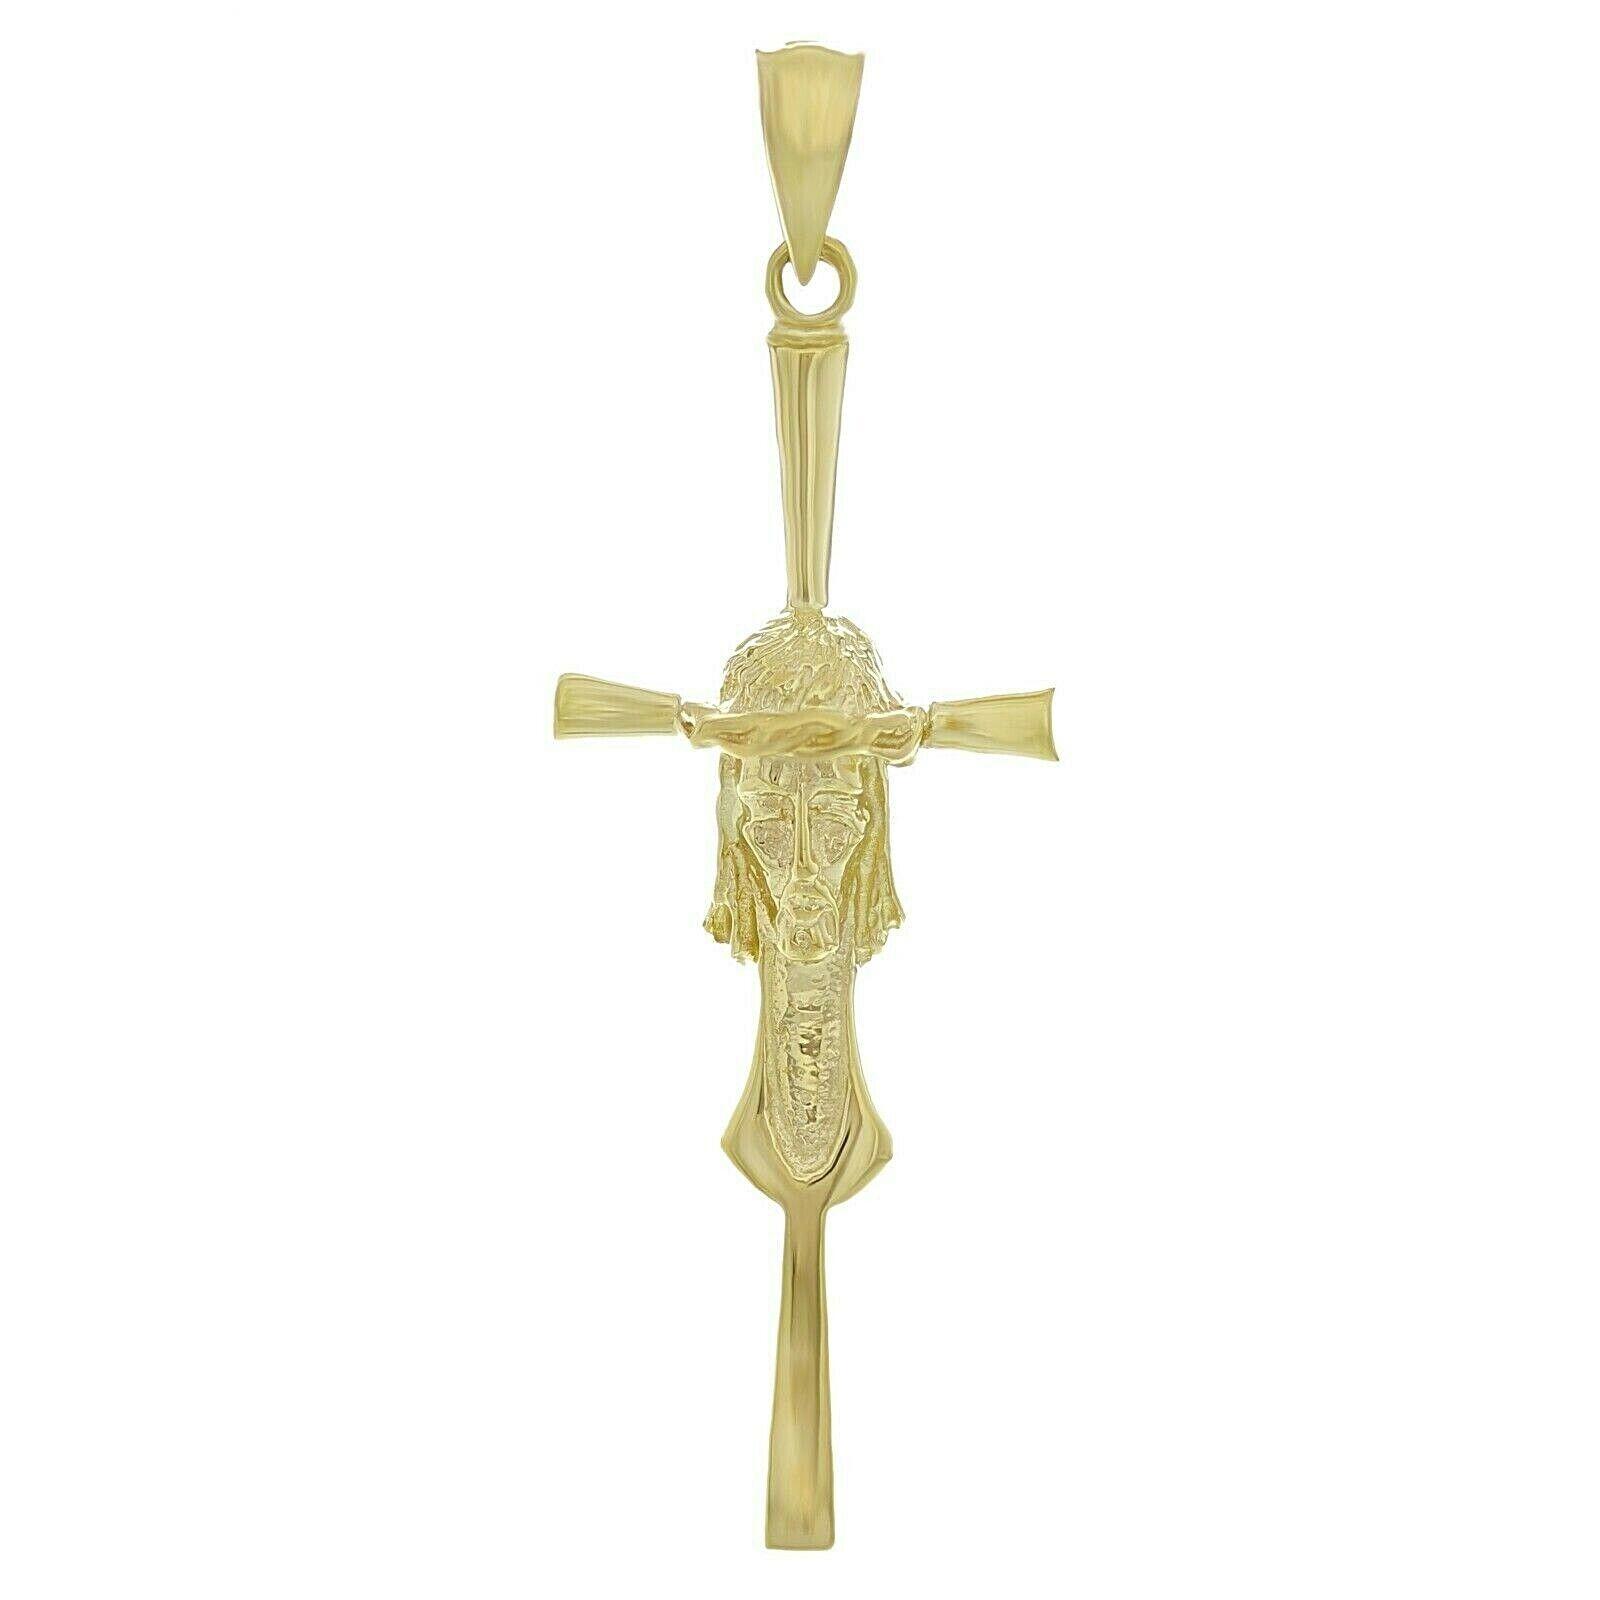 14k Two Tone Gold Jesus Christ Crucifix Filigree Cross Charm Pendant 1.8grams